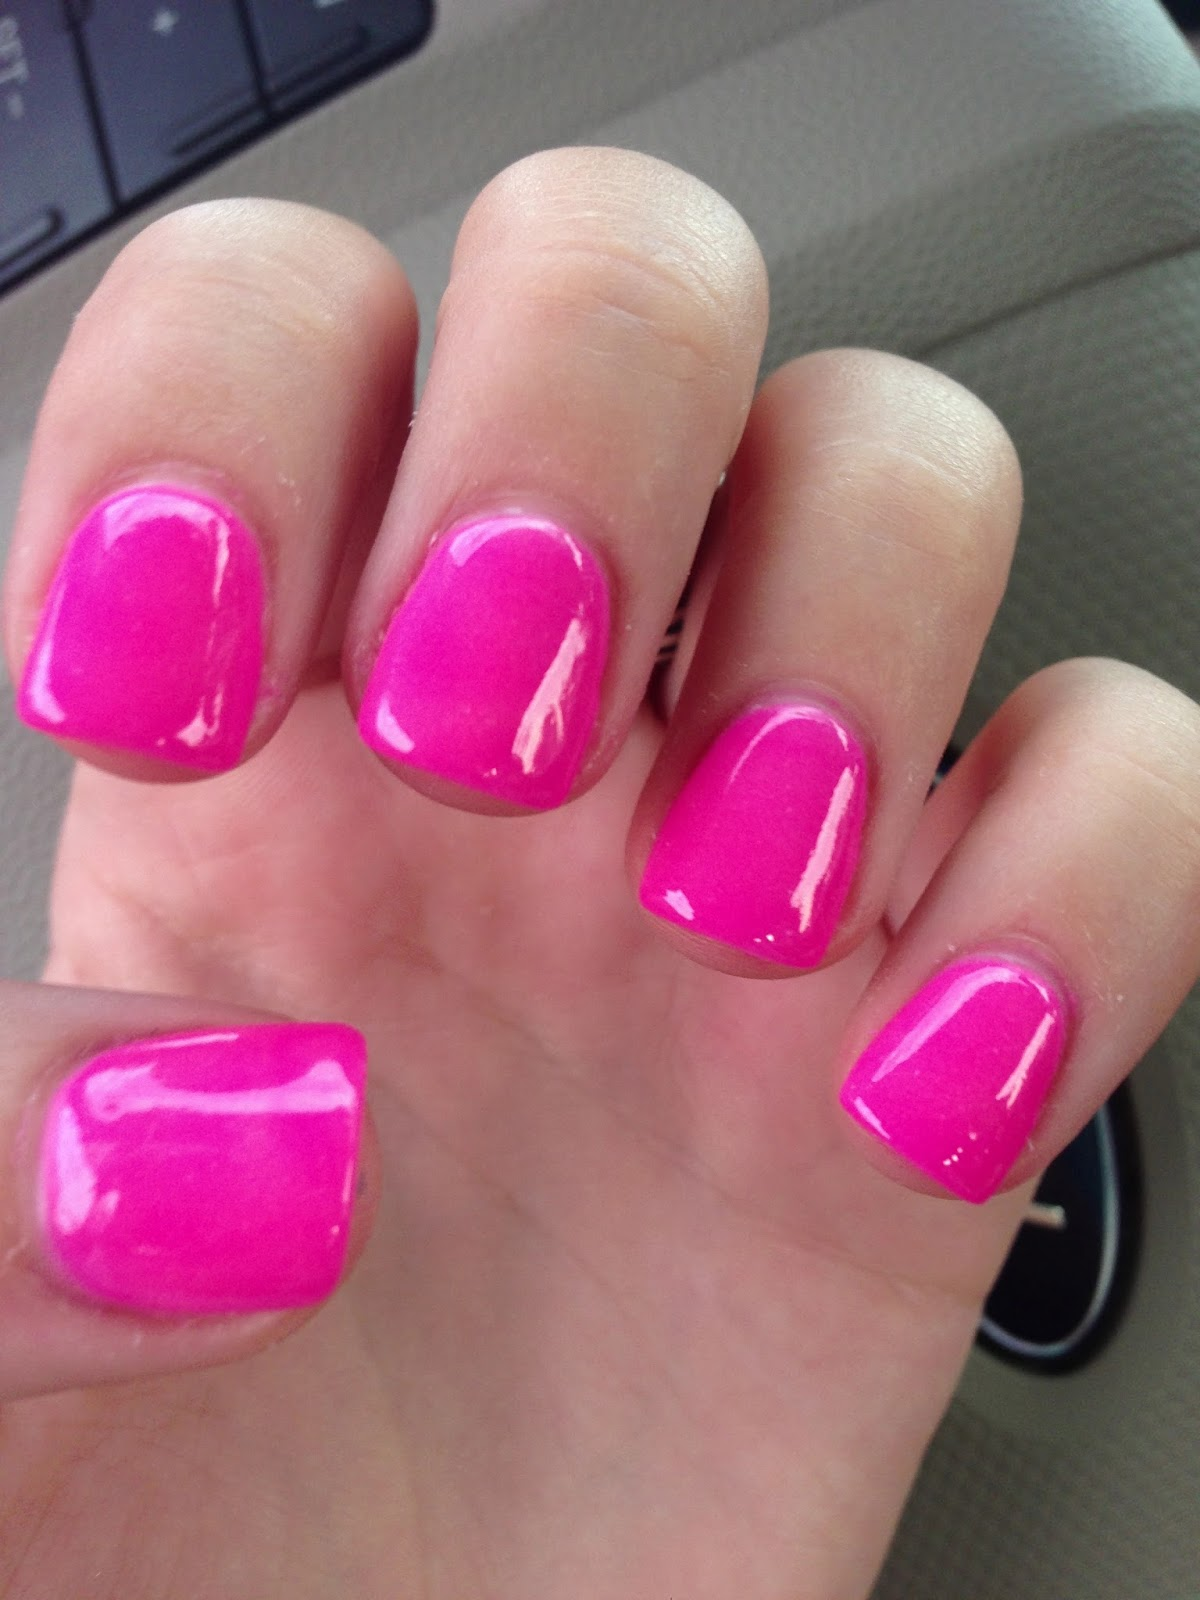 gel dipped nails photo - 1